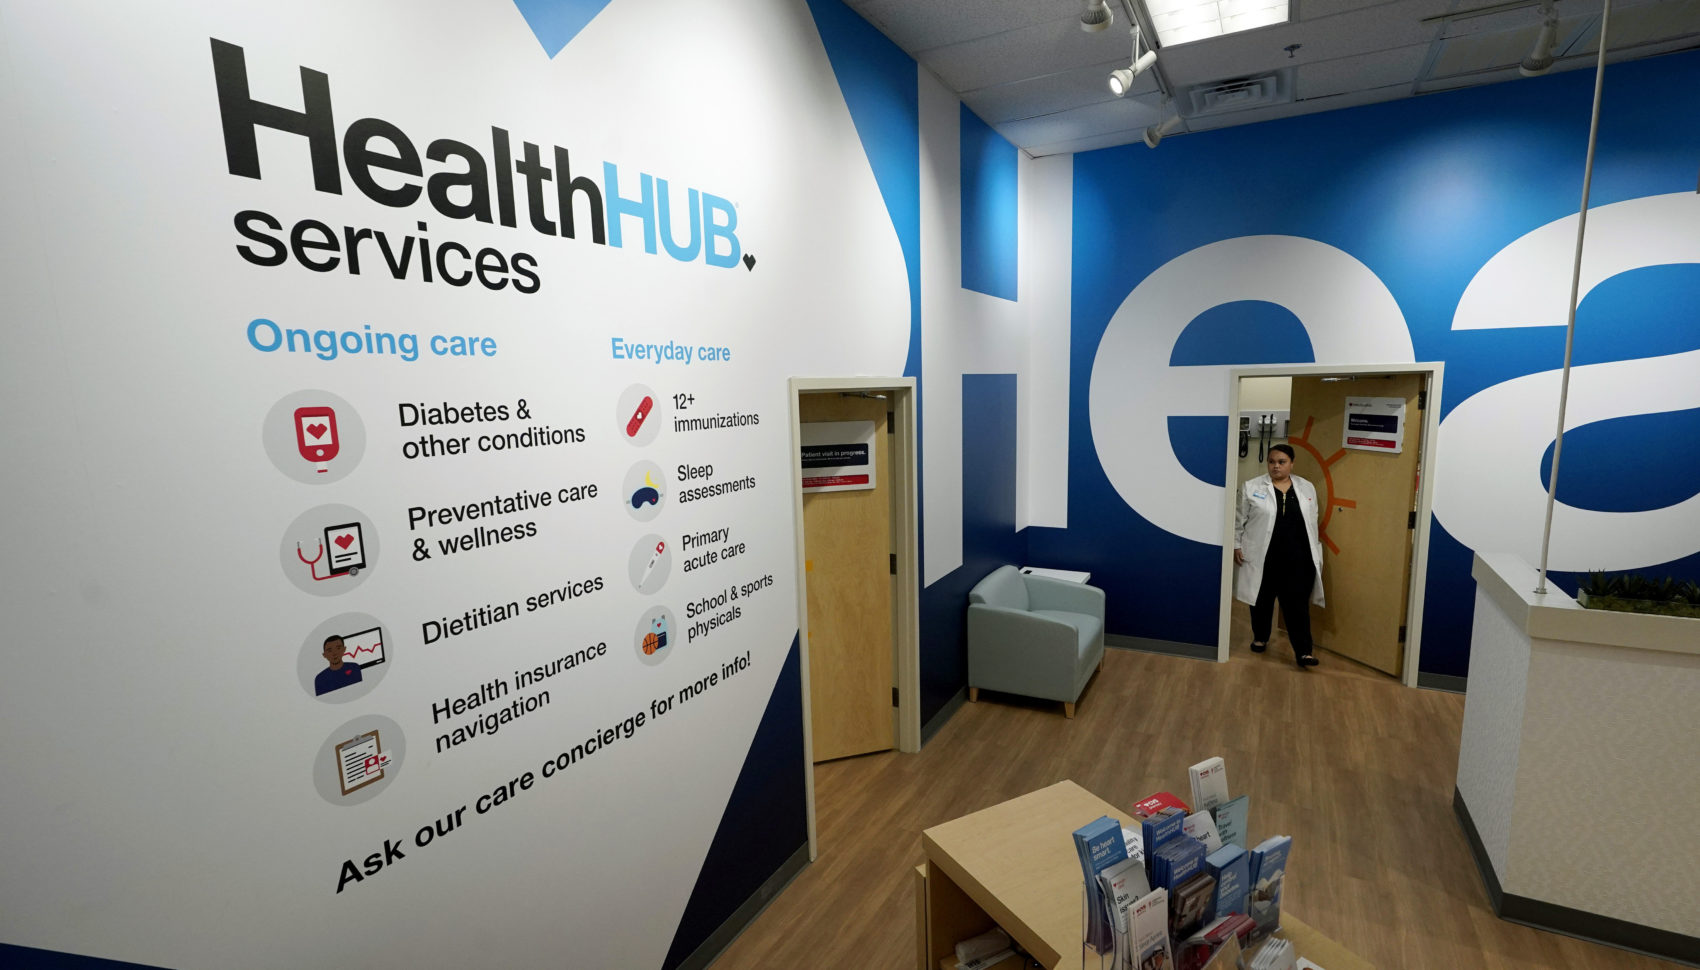 cvs announces further expansion into health care services